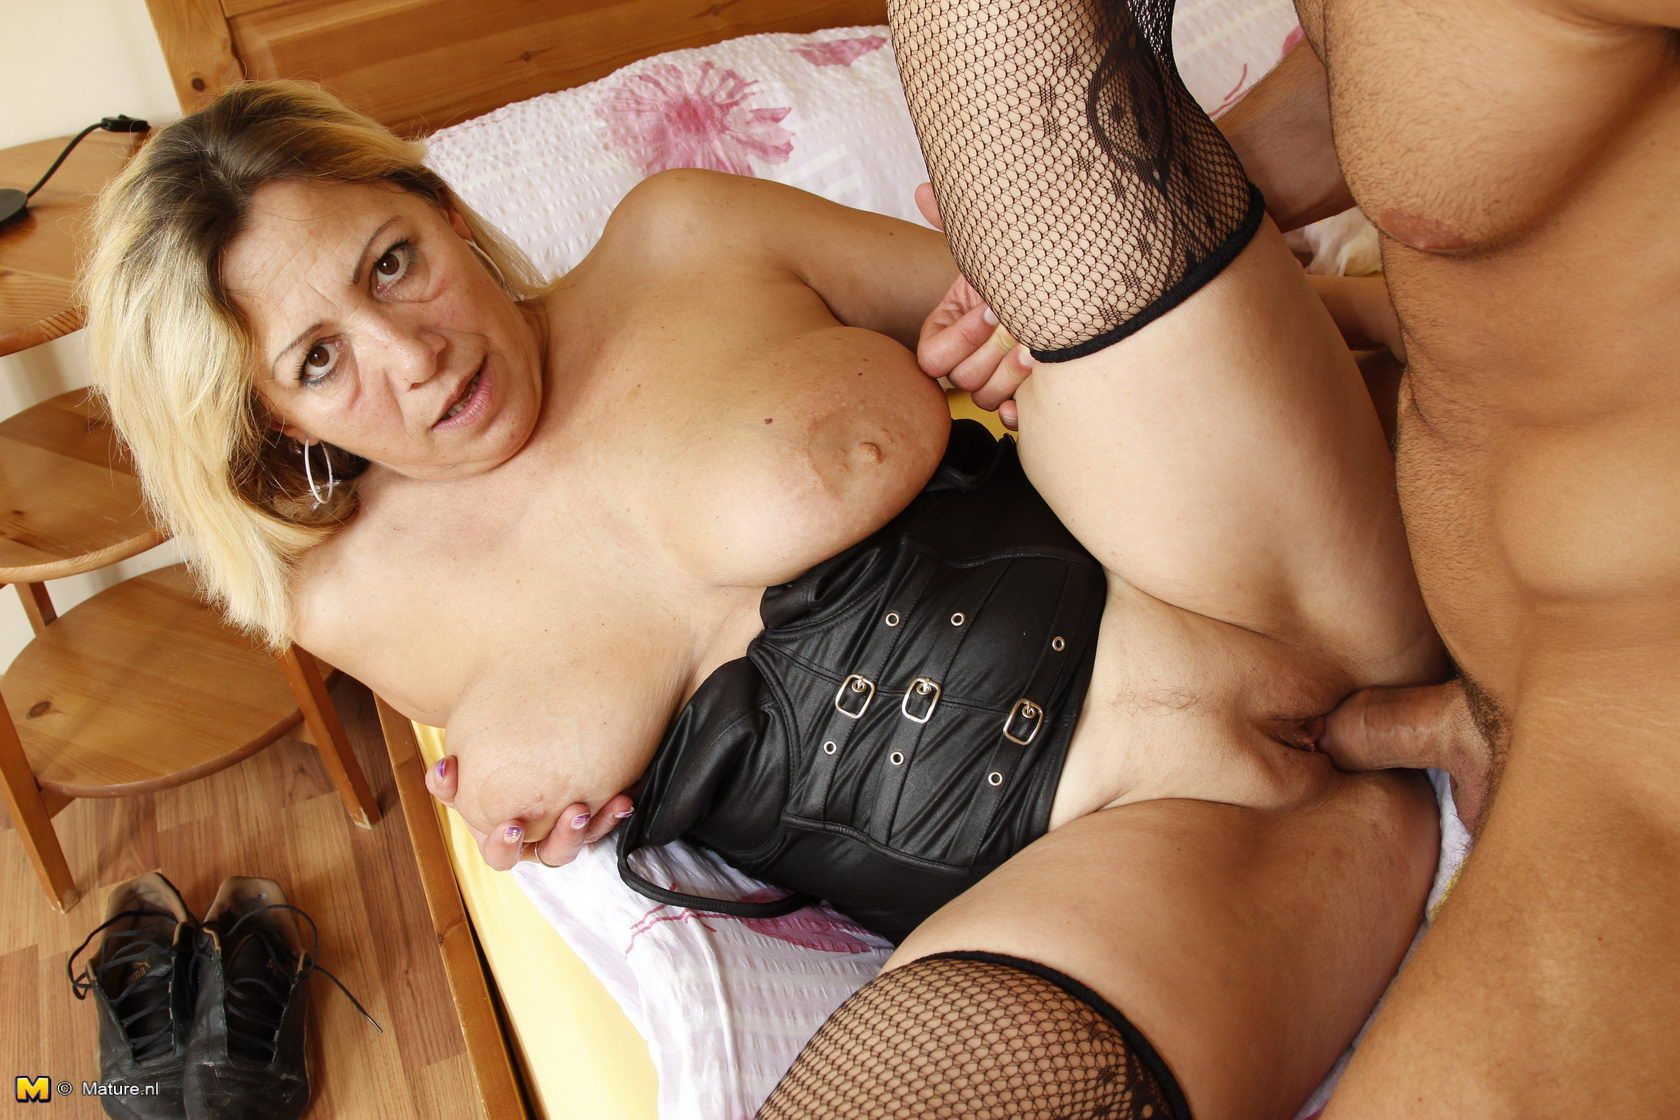 Hot girl dildo masturbates